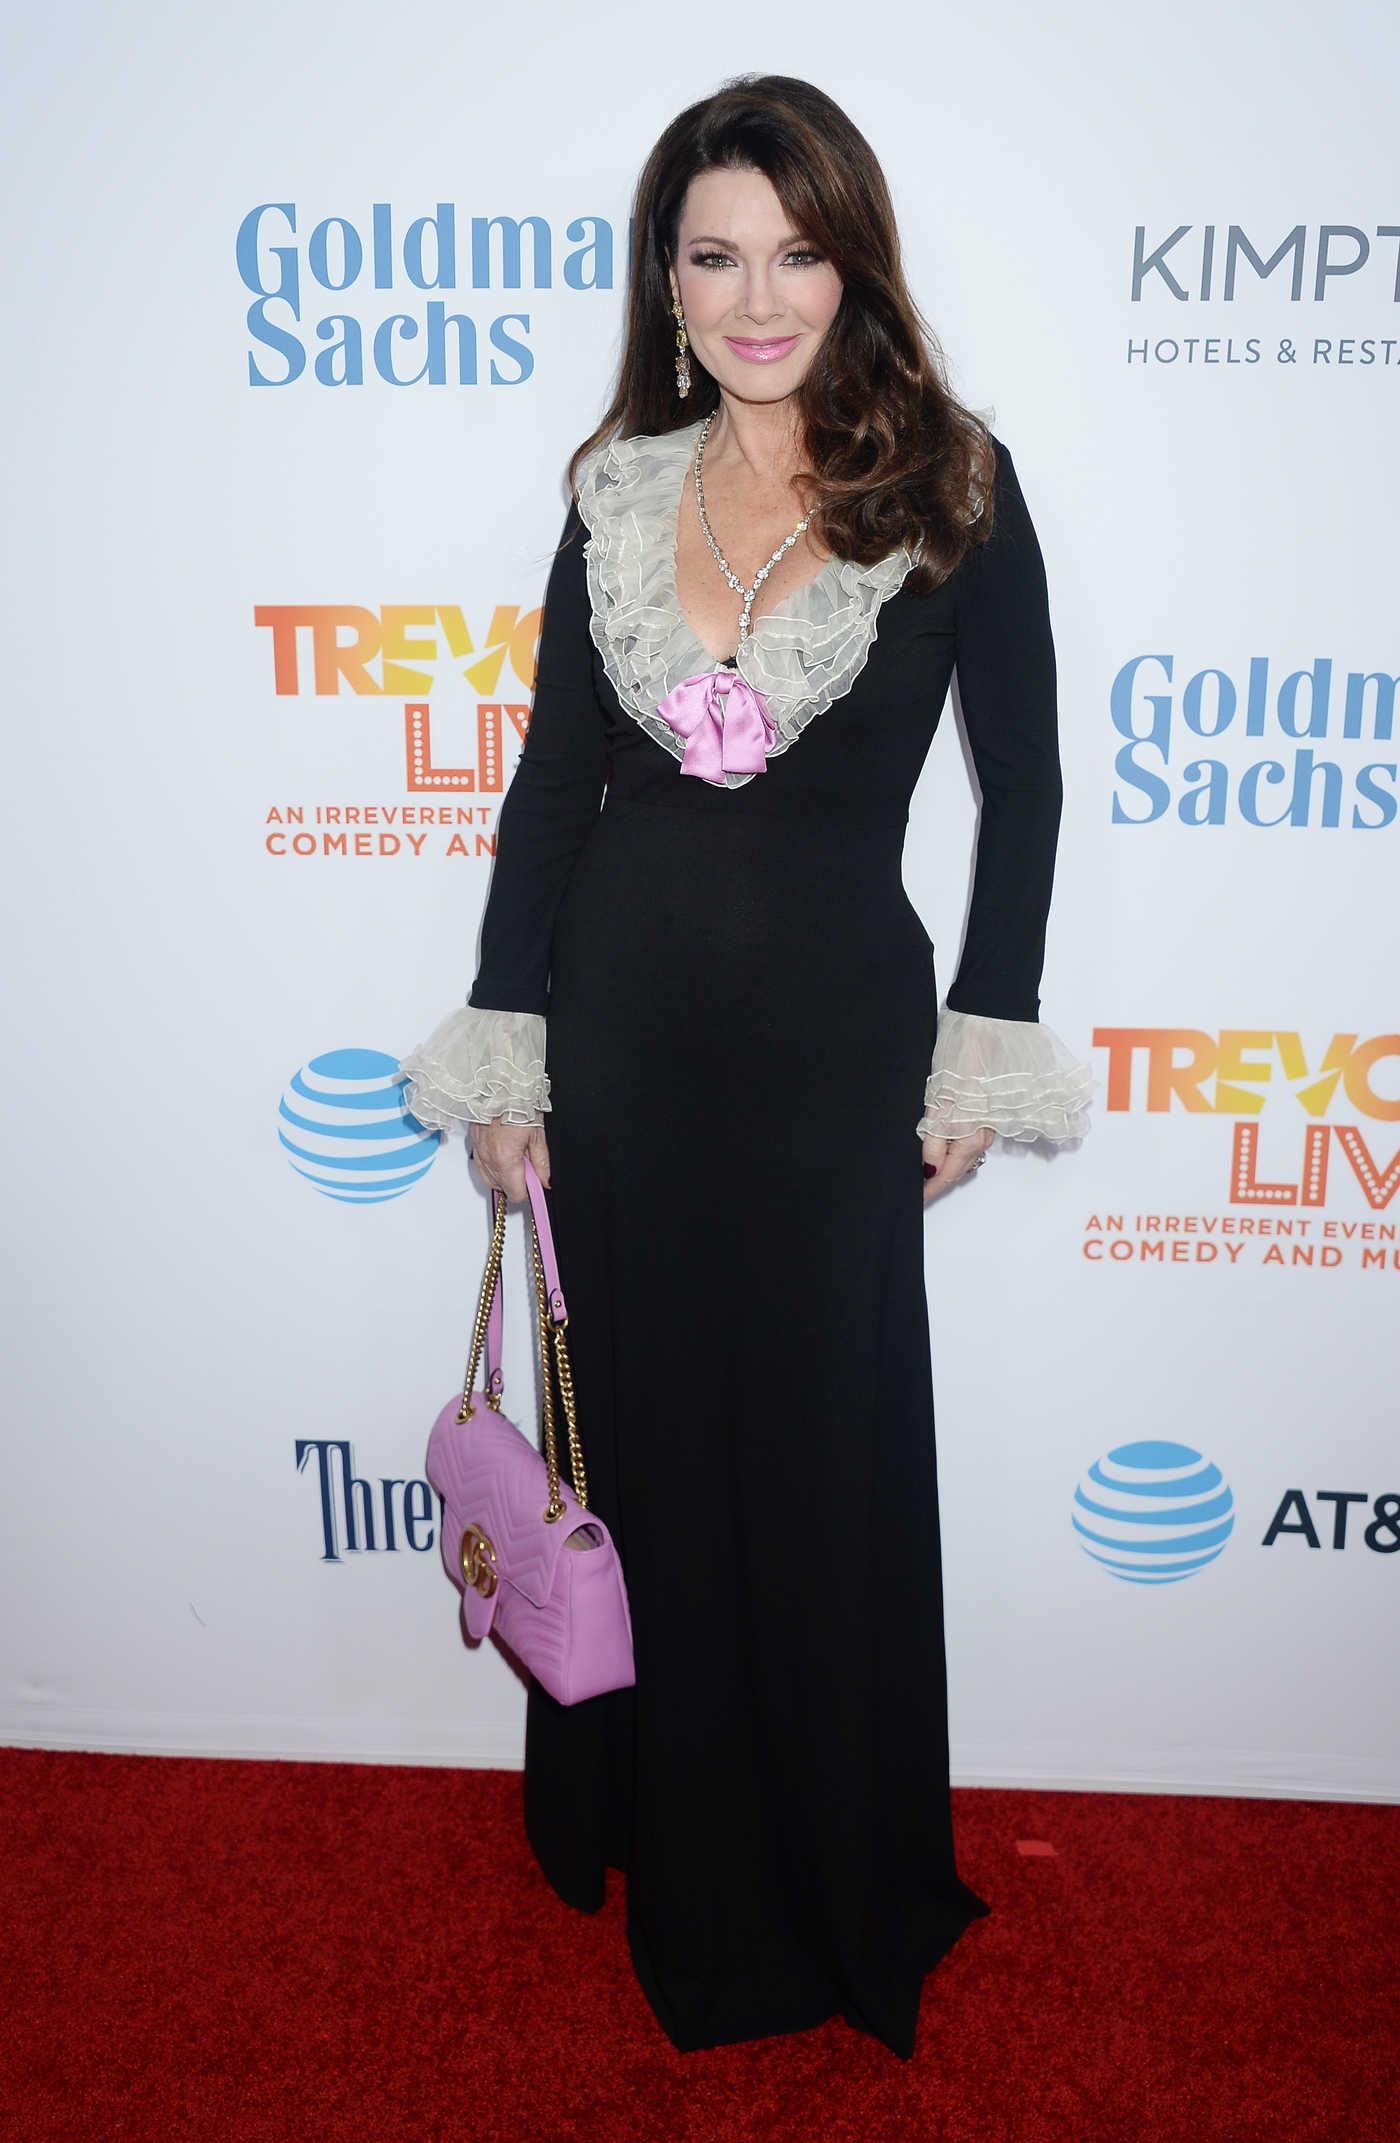 Lisa Vanderpump at the TrevorLIVE Fundraiser in Los Angeles 12/04/2016